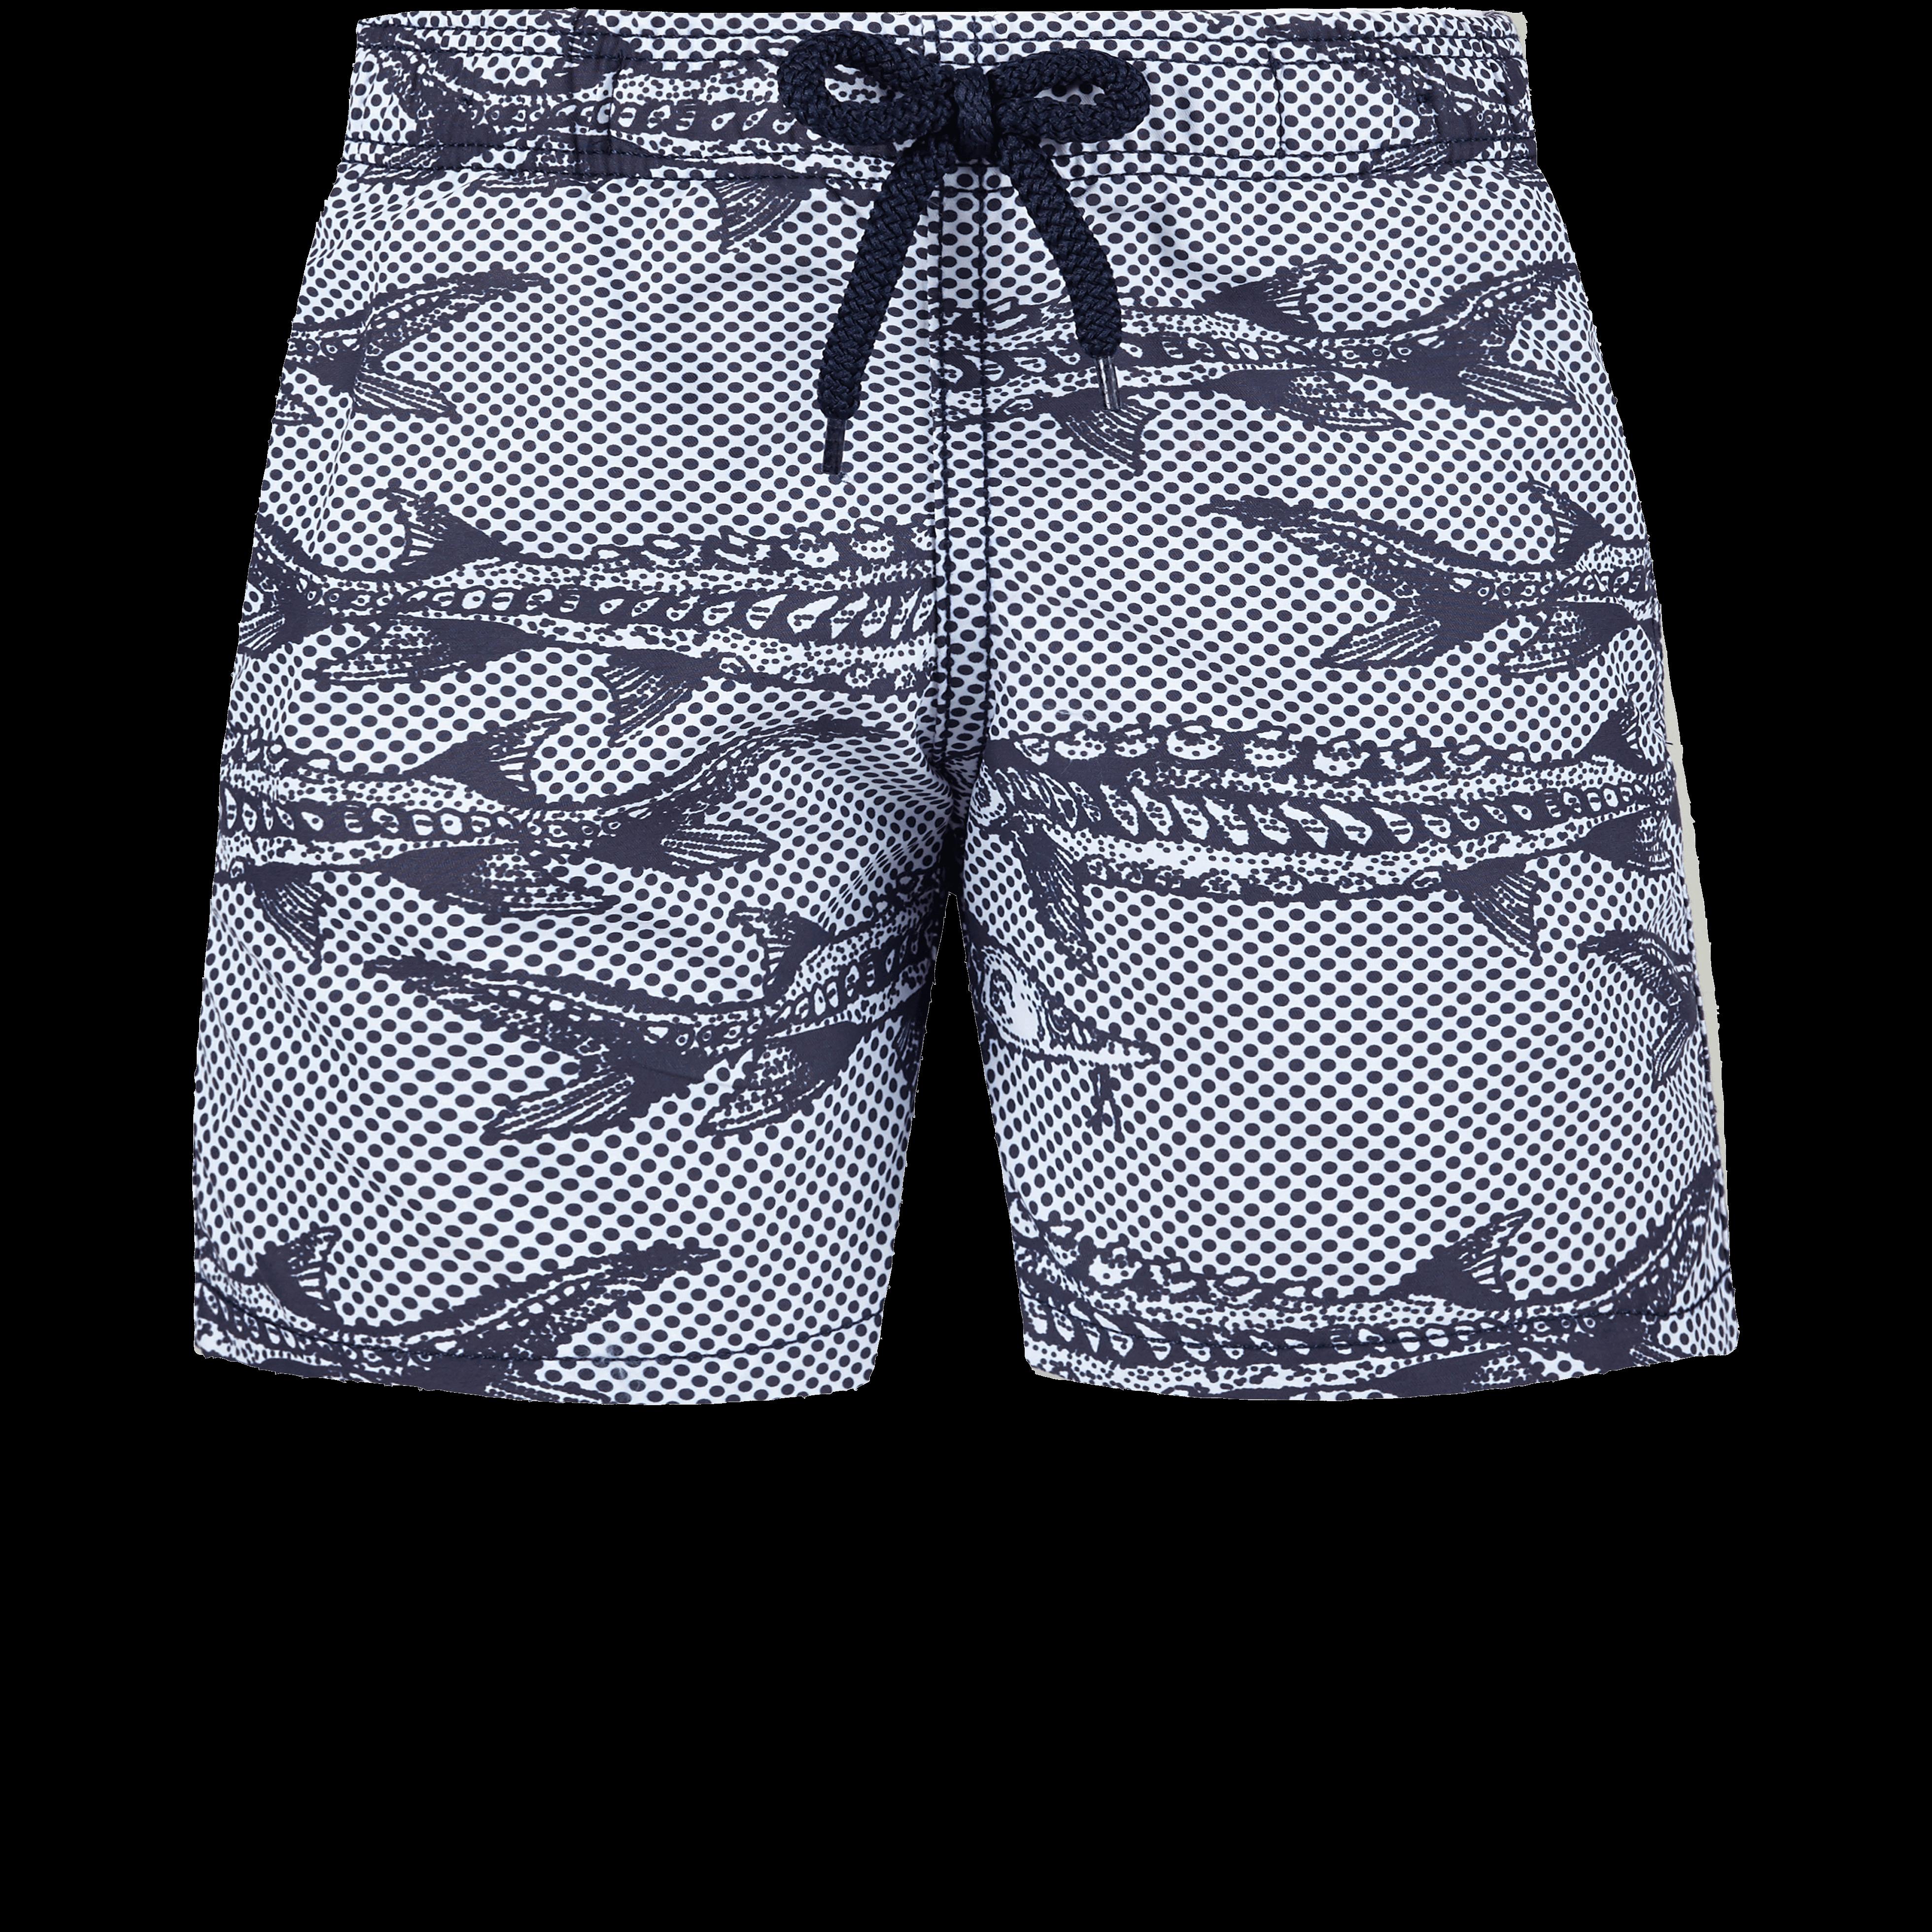 VILEBREQUIN | Boys Swimwear - Boys Swimwear Belle ou Gars - SWIMMING TRUNK - JIM - White - 14 - Vilebrequin | Goxip